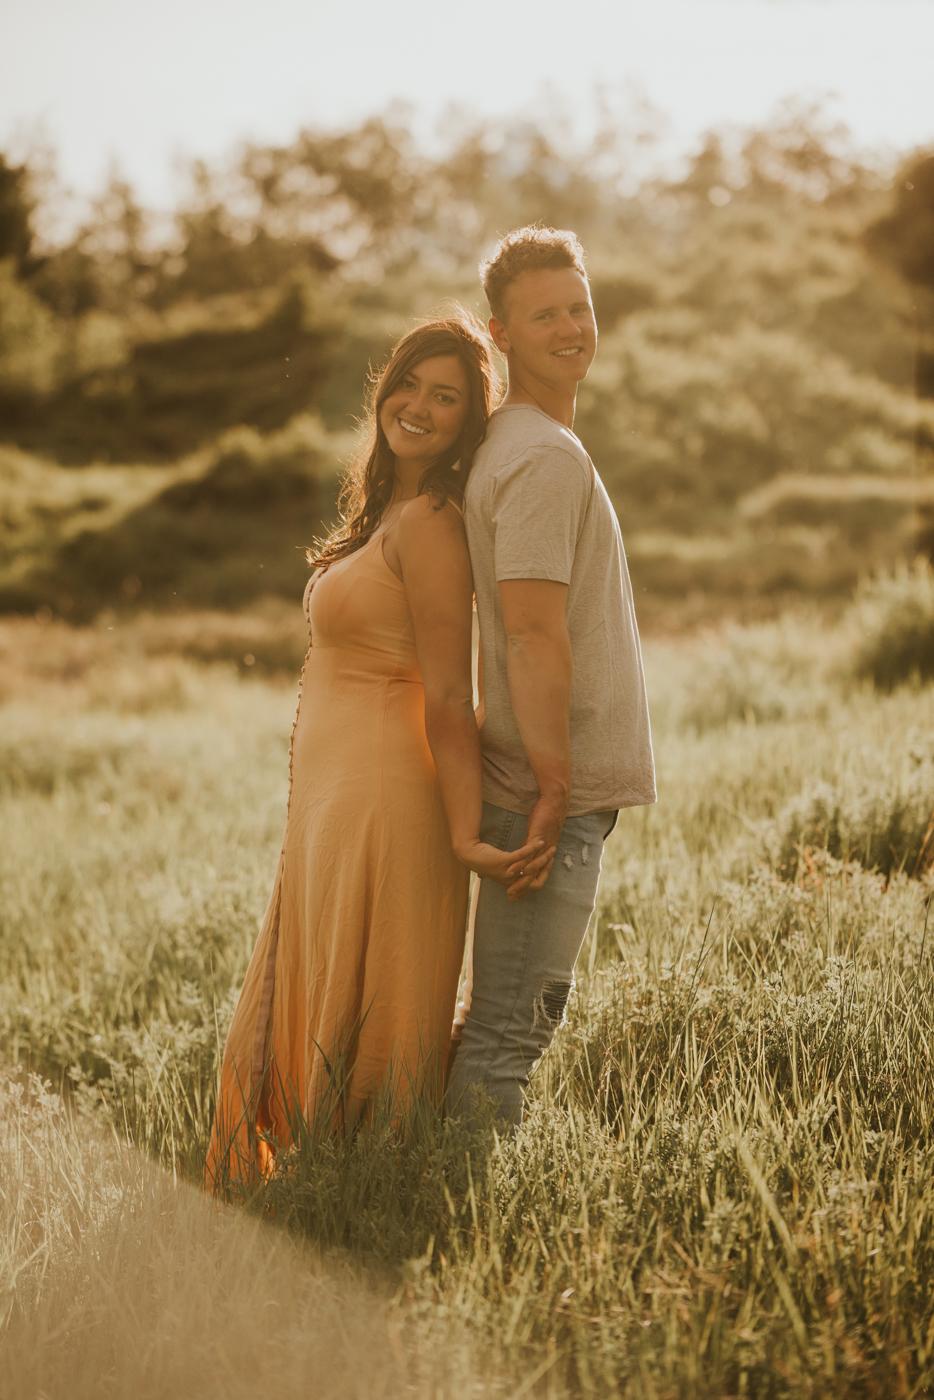 tyraephotography_photographer_wedding_elopement_engagement_photography-6210.jpg